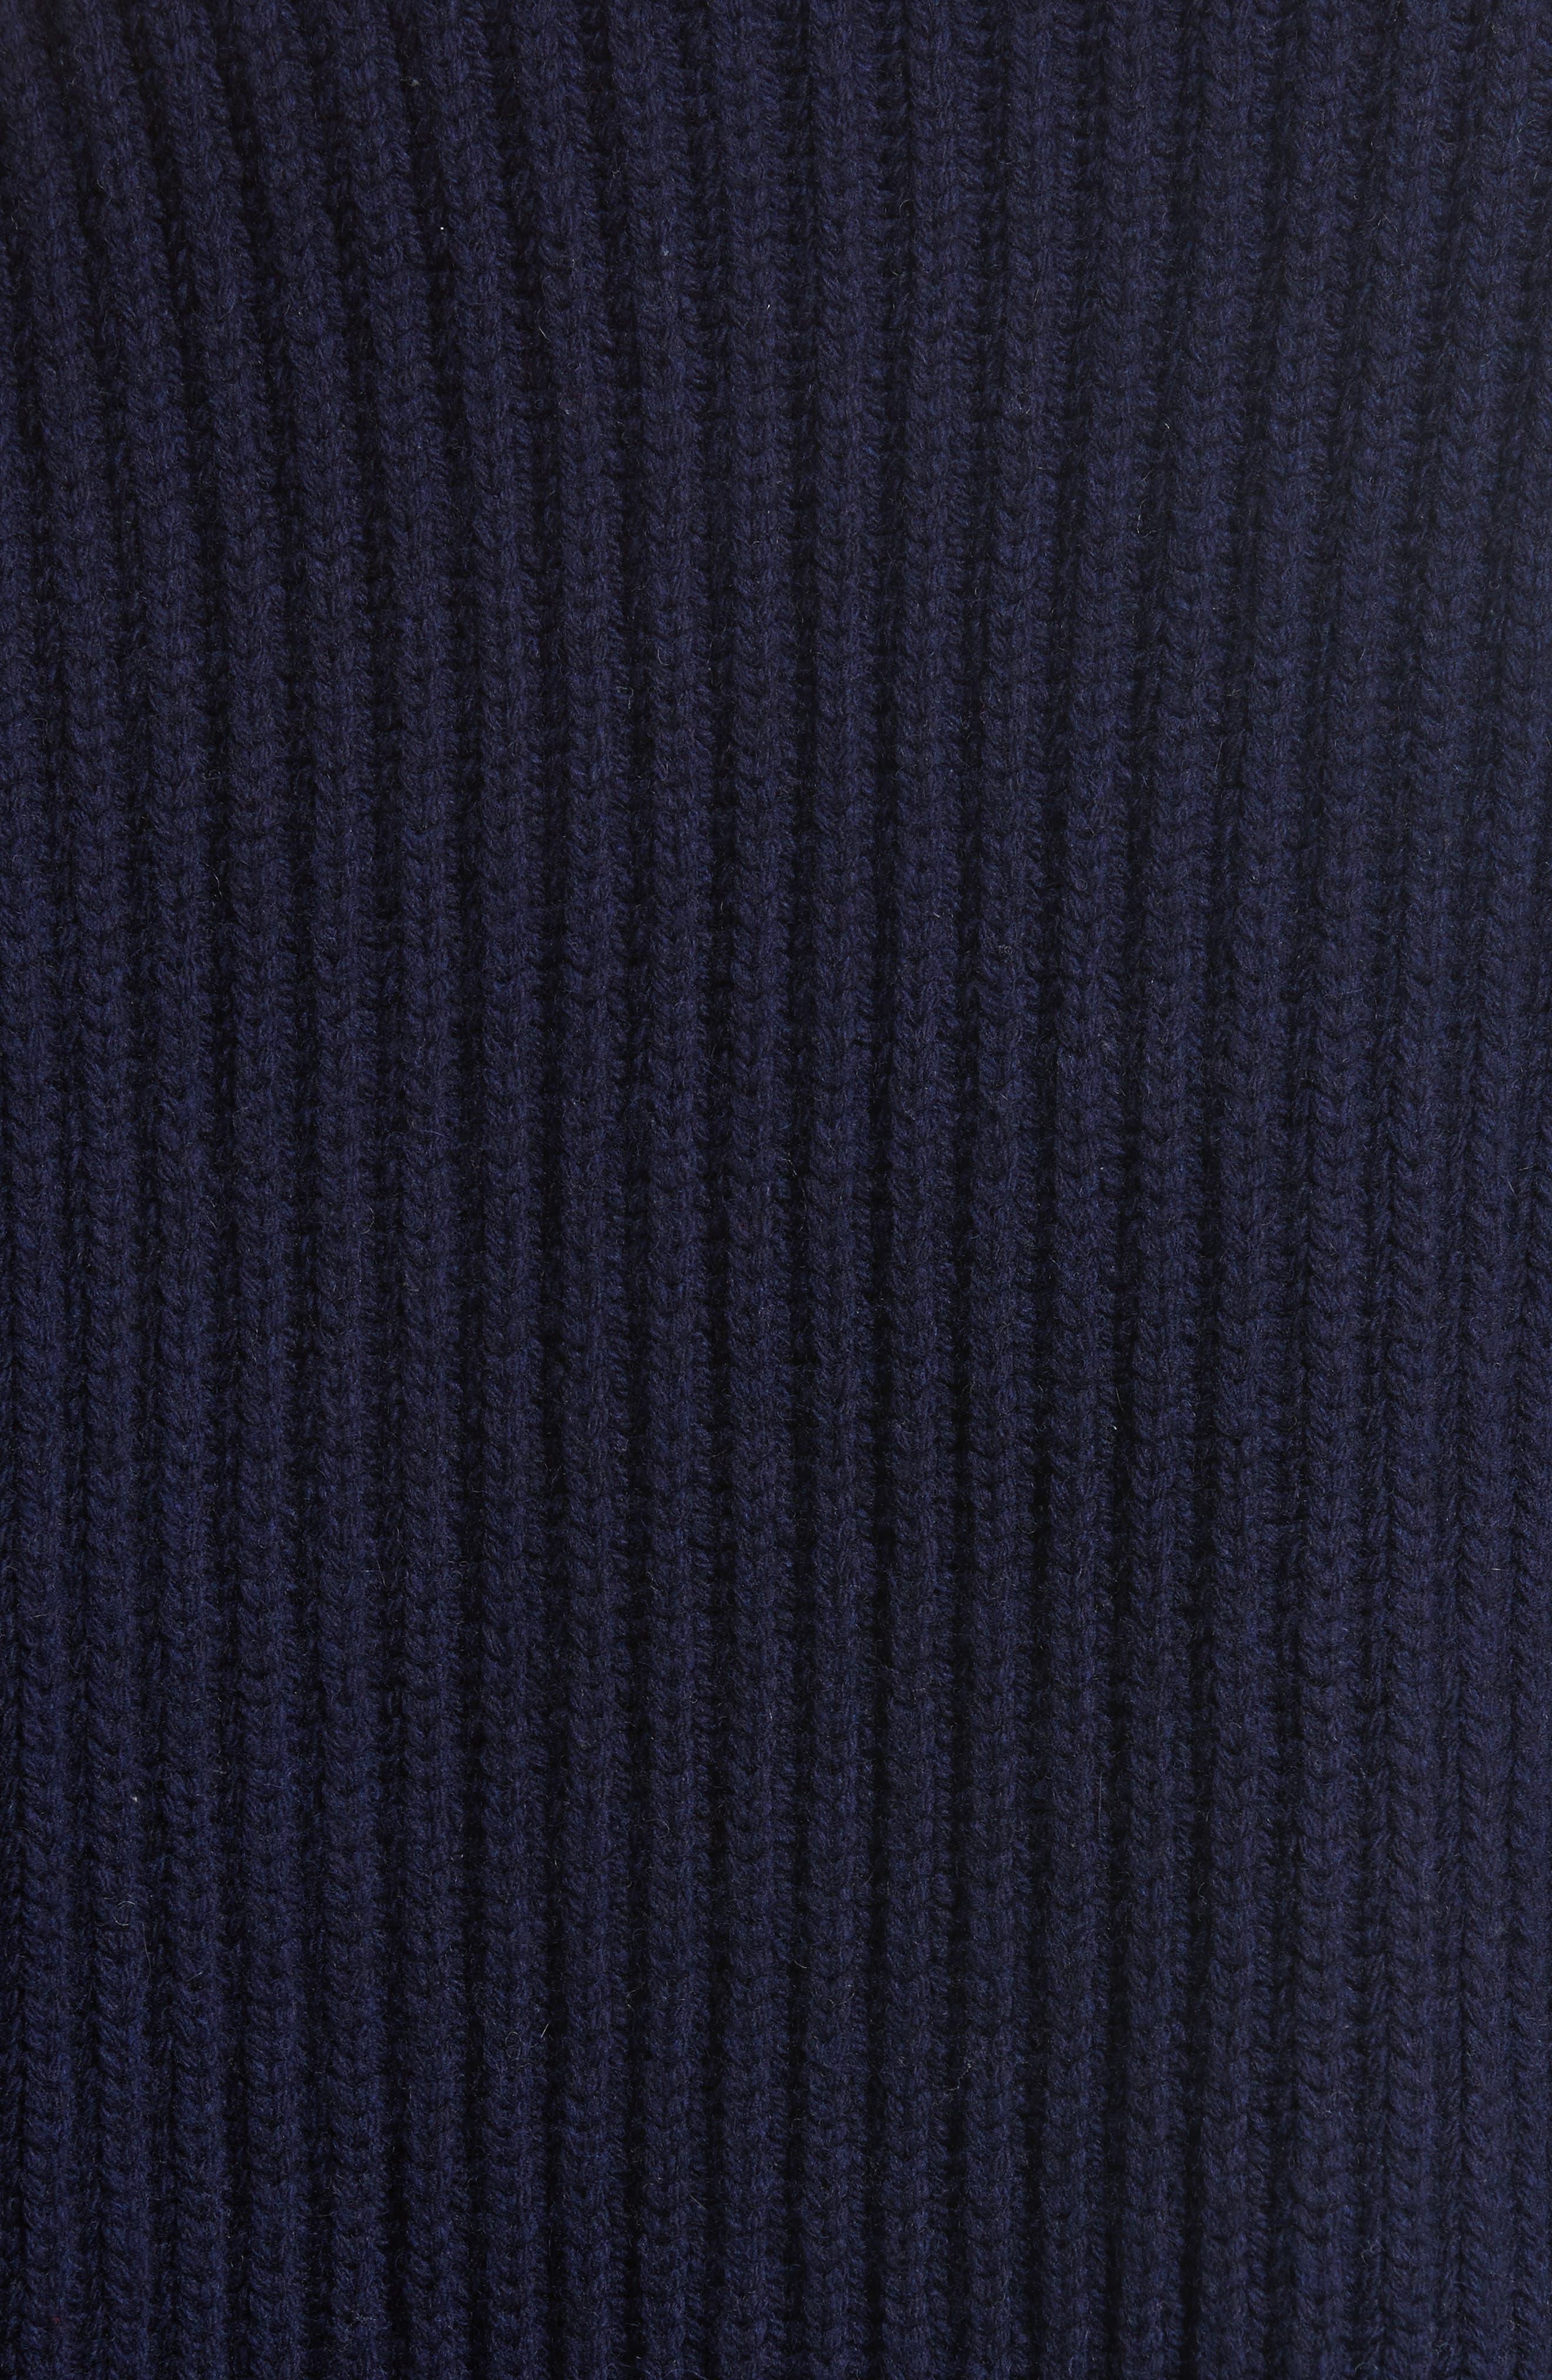 Crop Wool Sweater,                             Alternate thumbnail 5, color,                             410